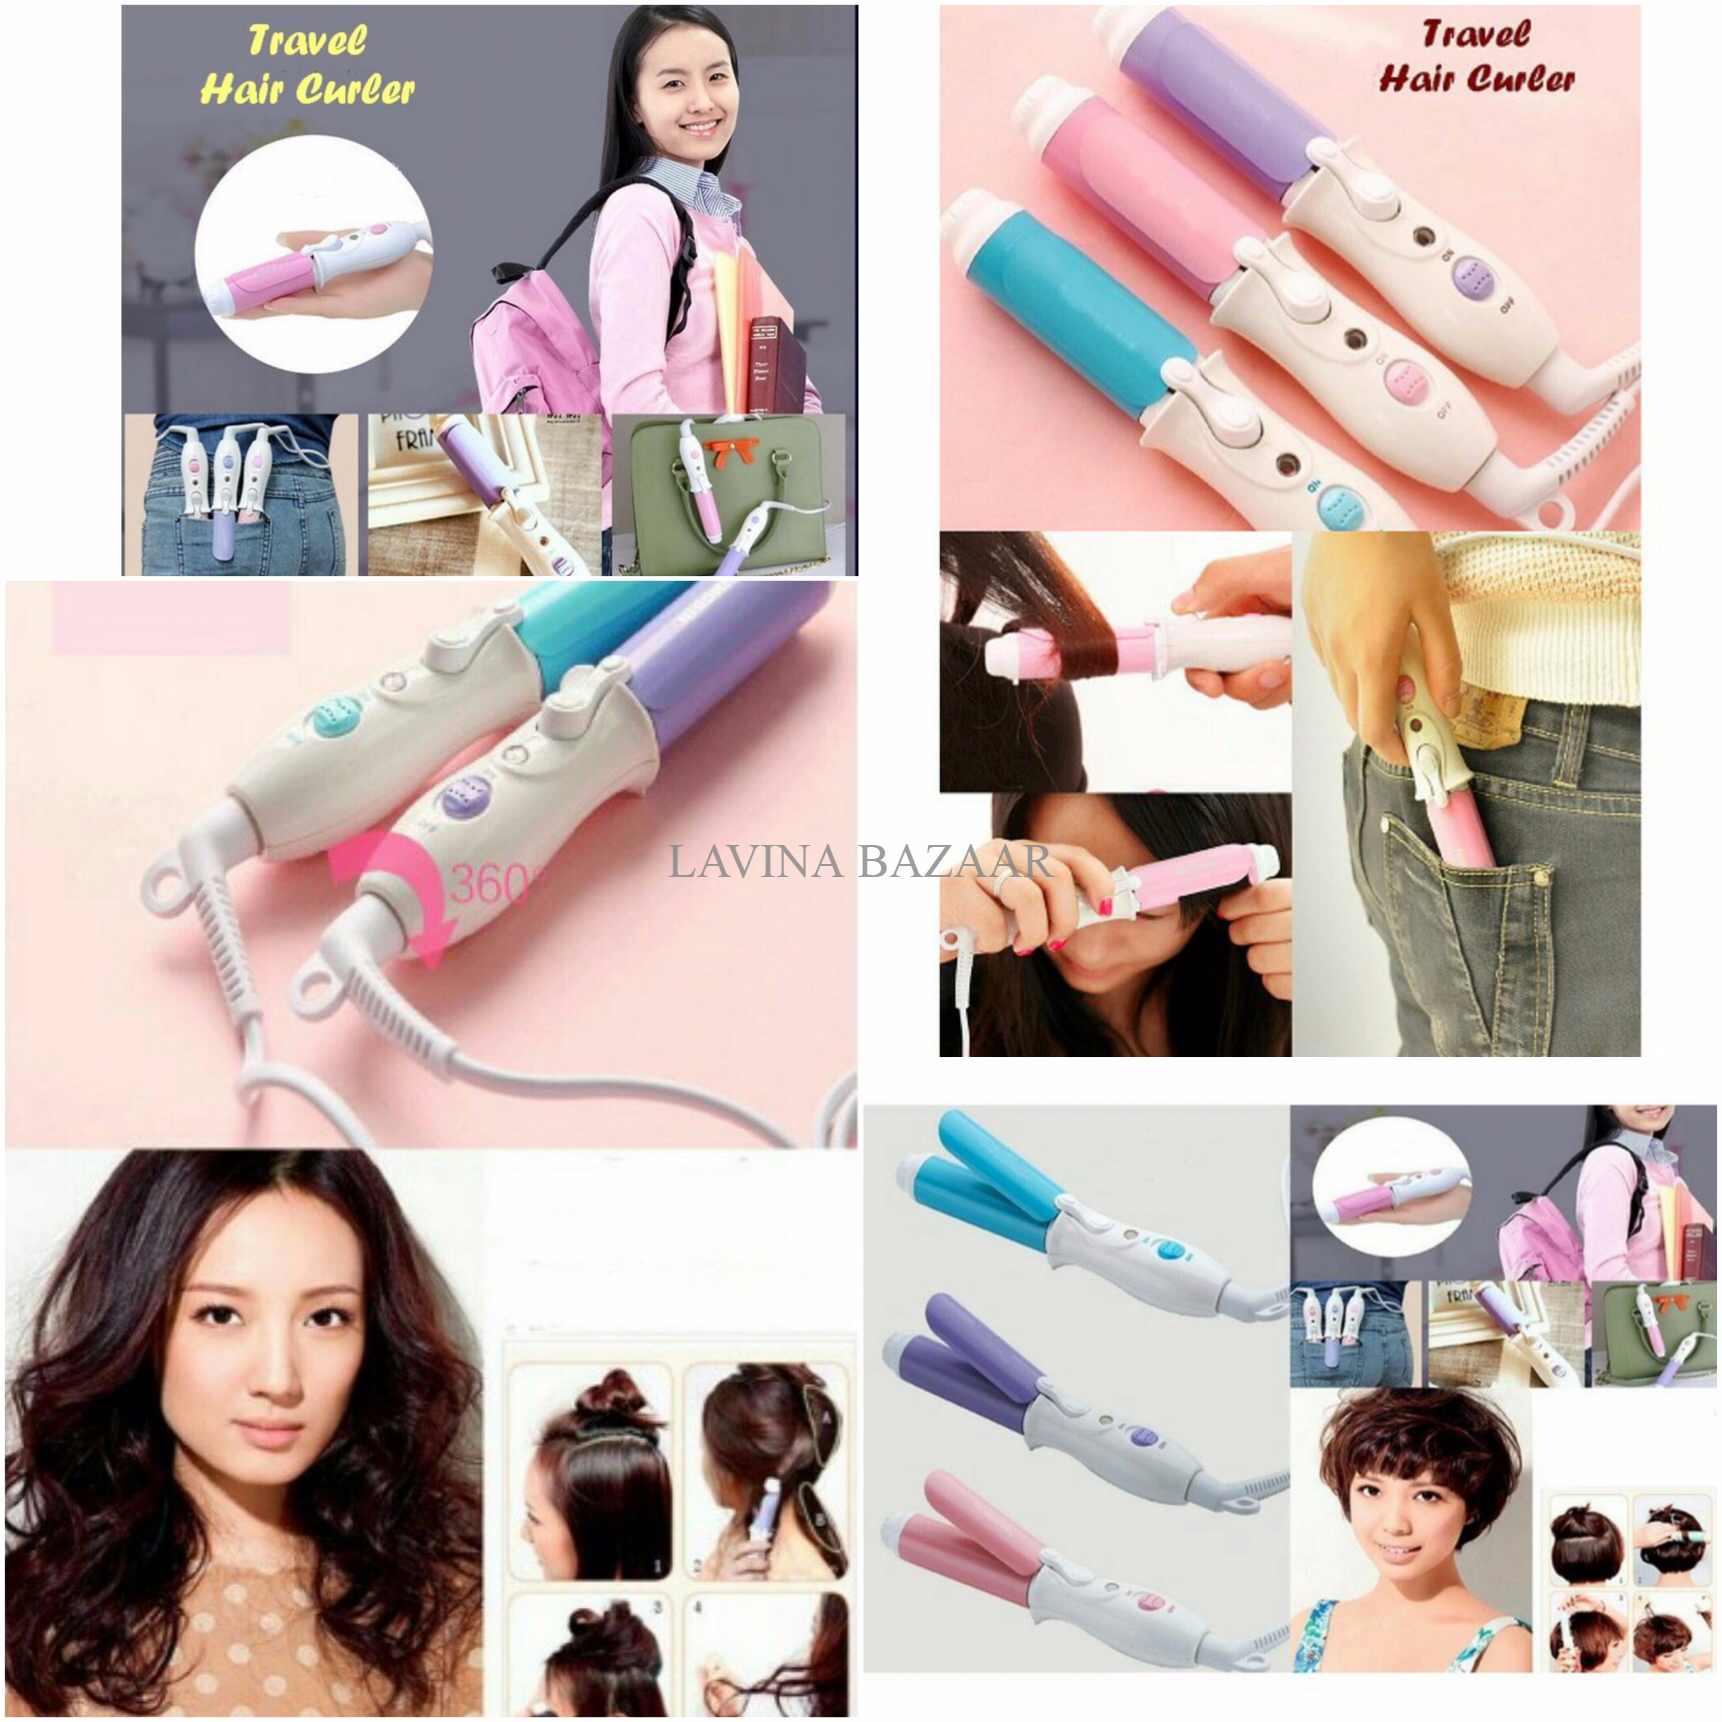 Jual Mini Travel Hair Curler Catok Rambut Lavina Bazaar Tokopedia